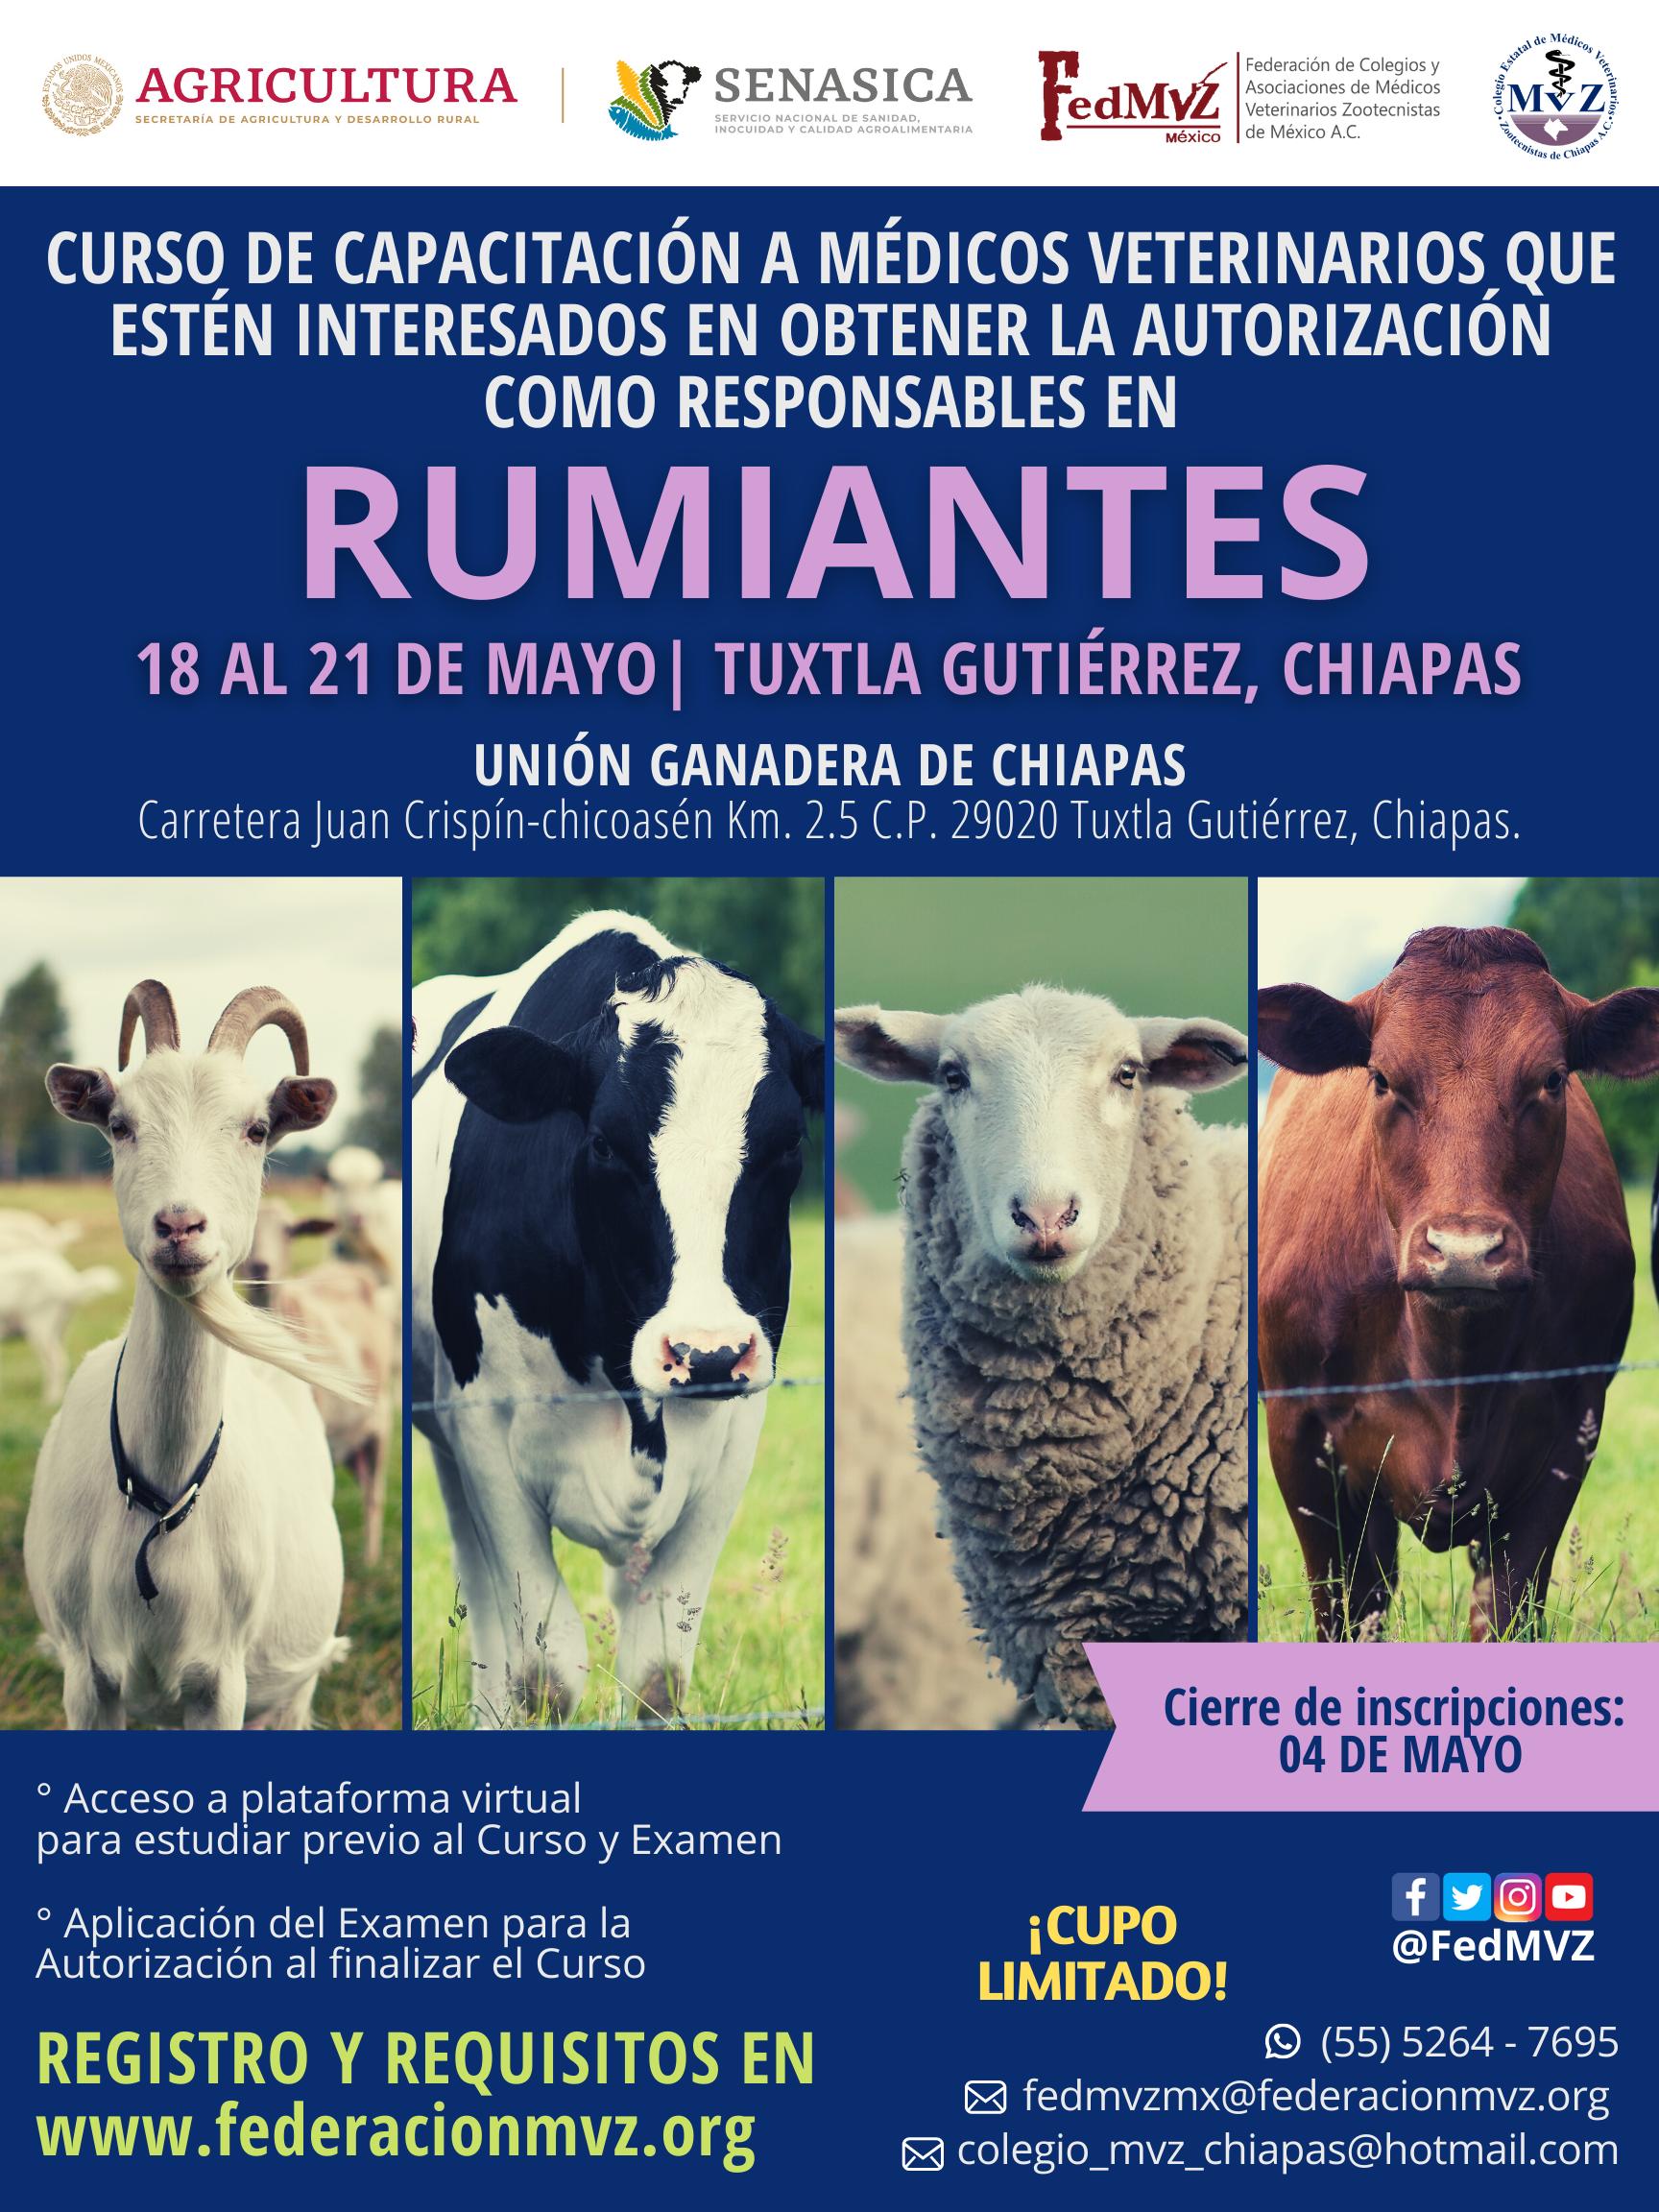 CURSO MVRA RUMIANTES CHIAPAS MAYO 2021